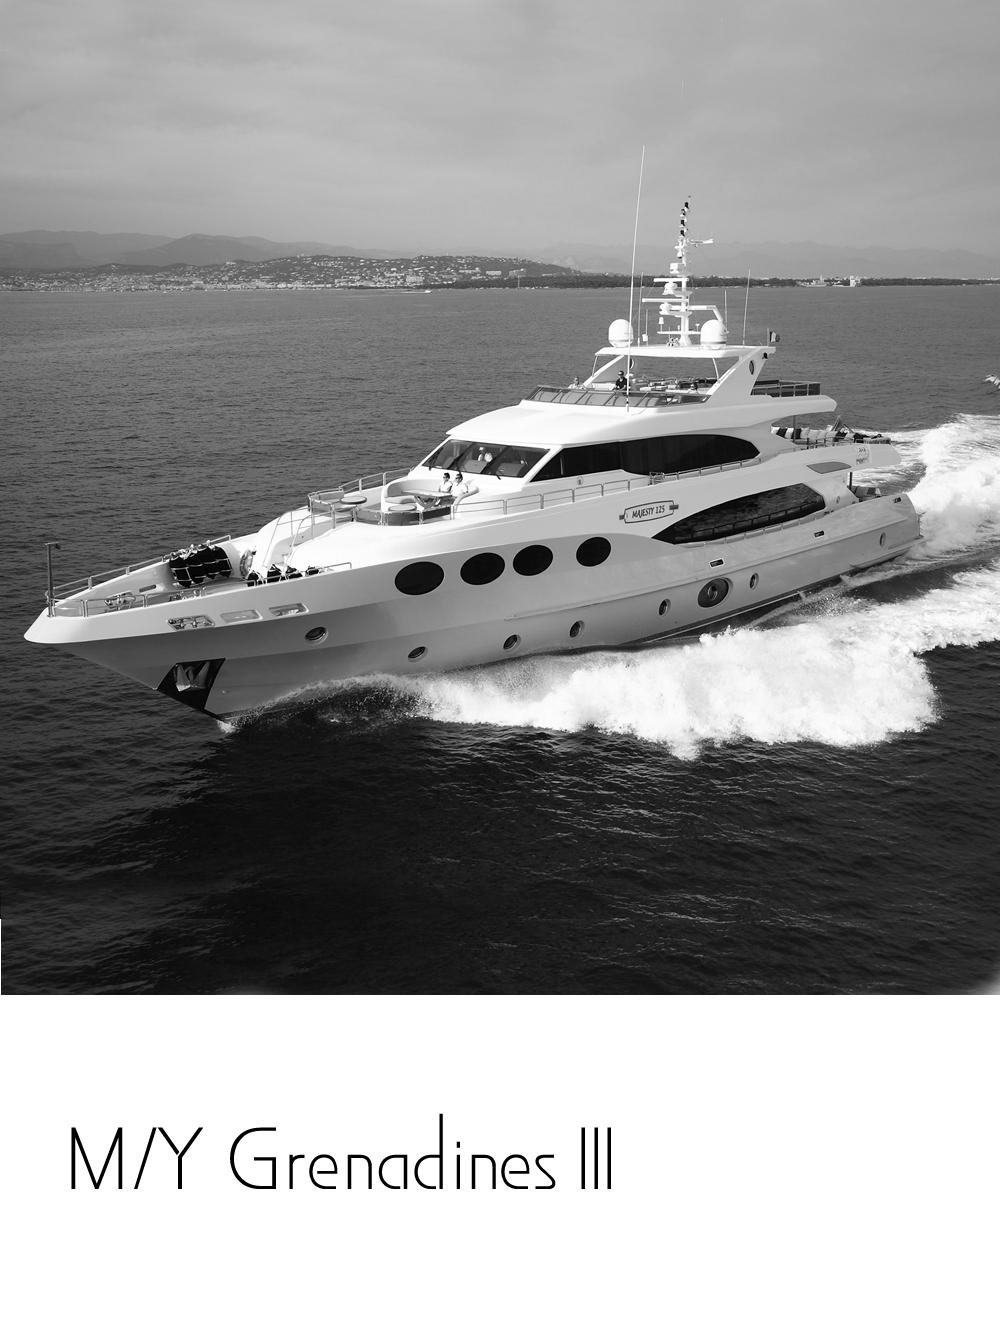 Grenadines III.JPG